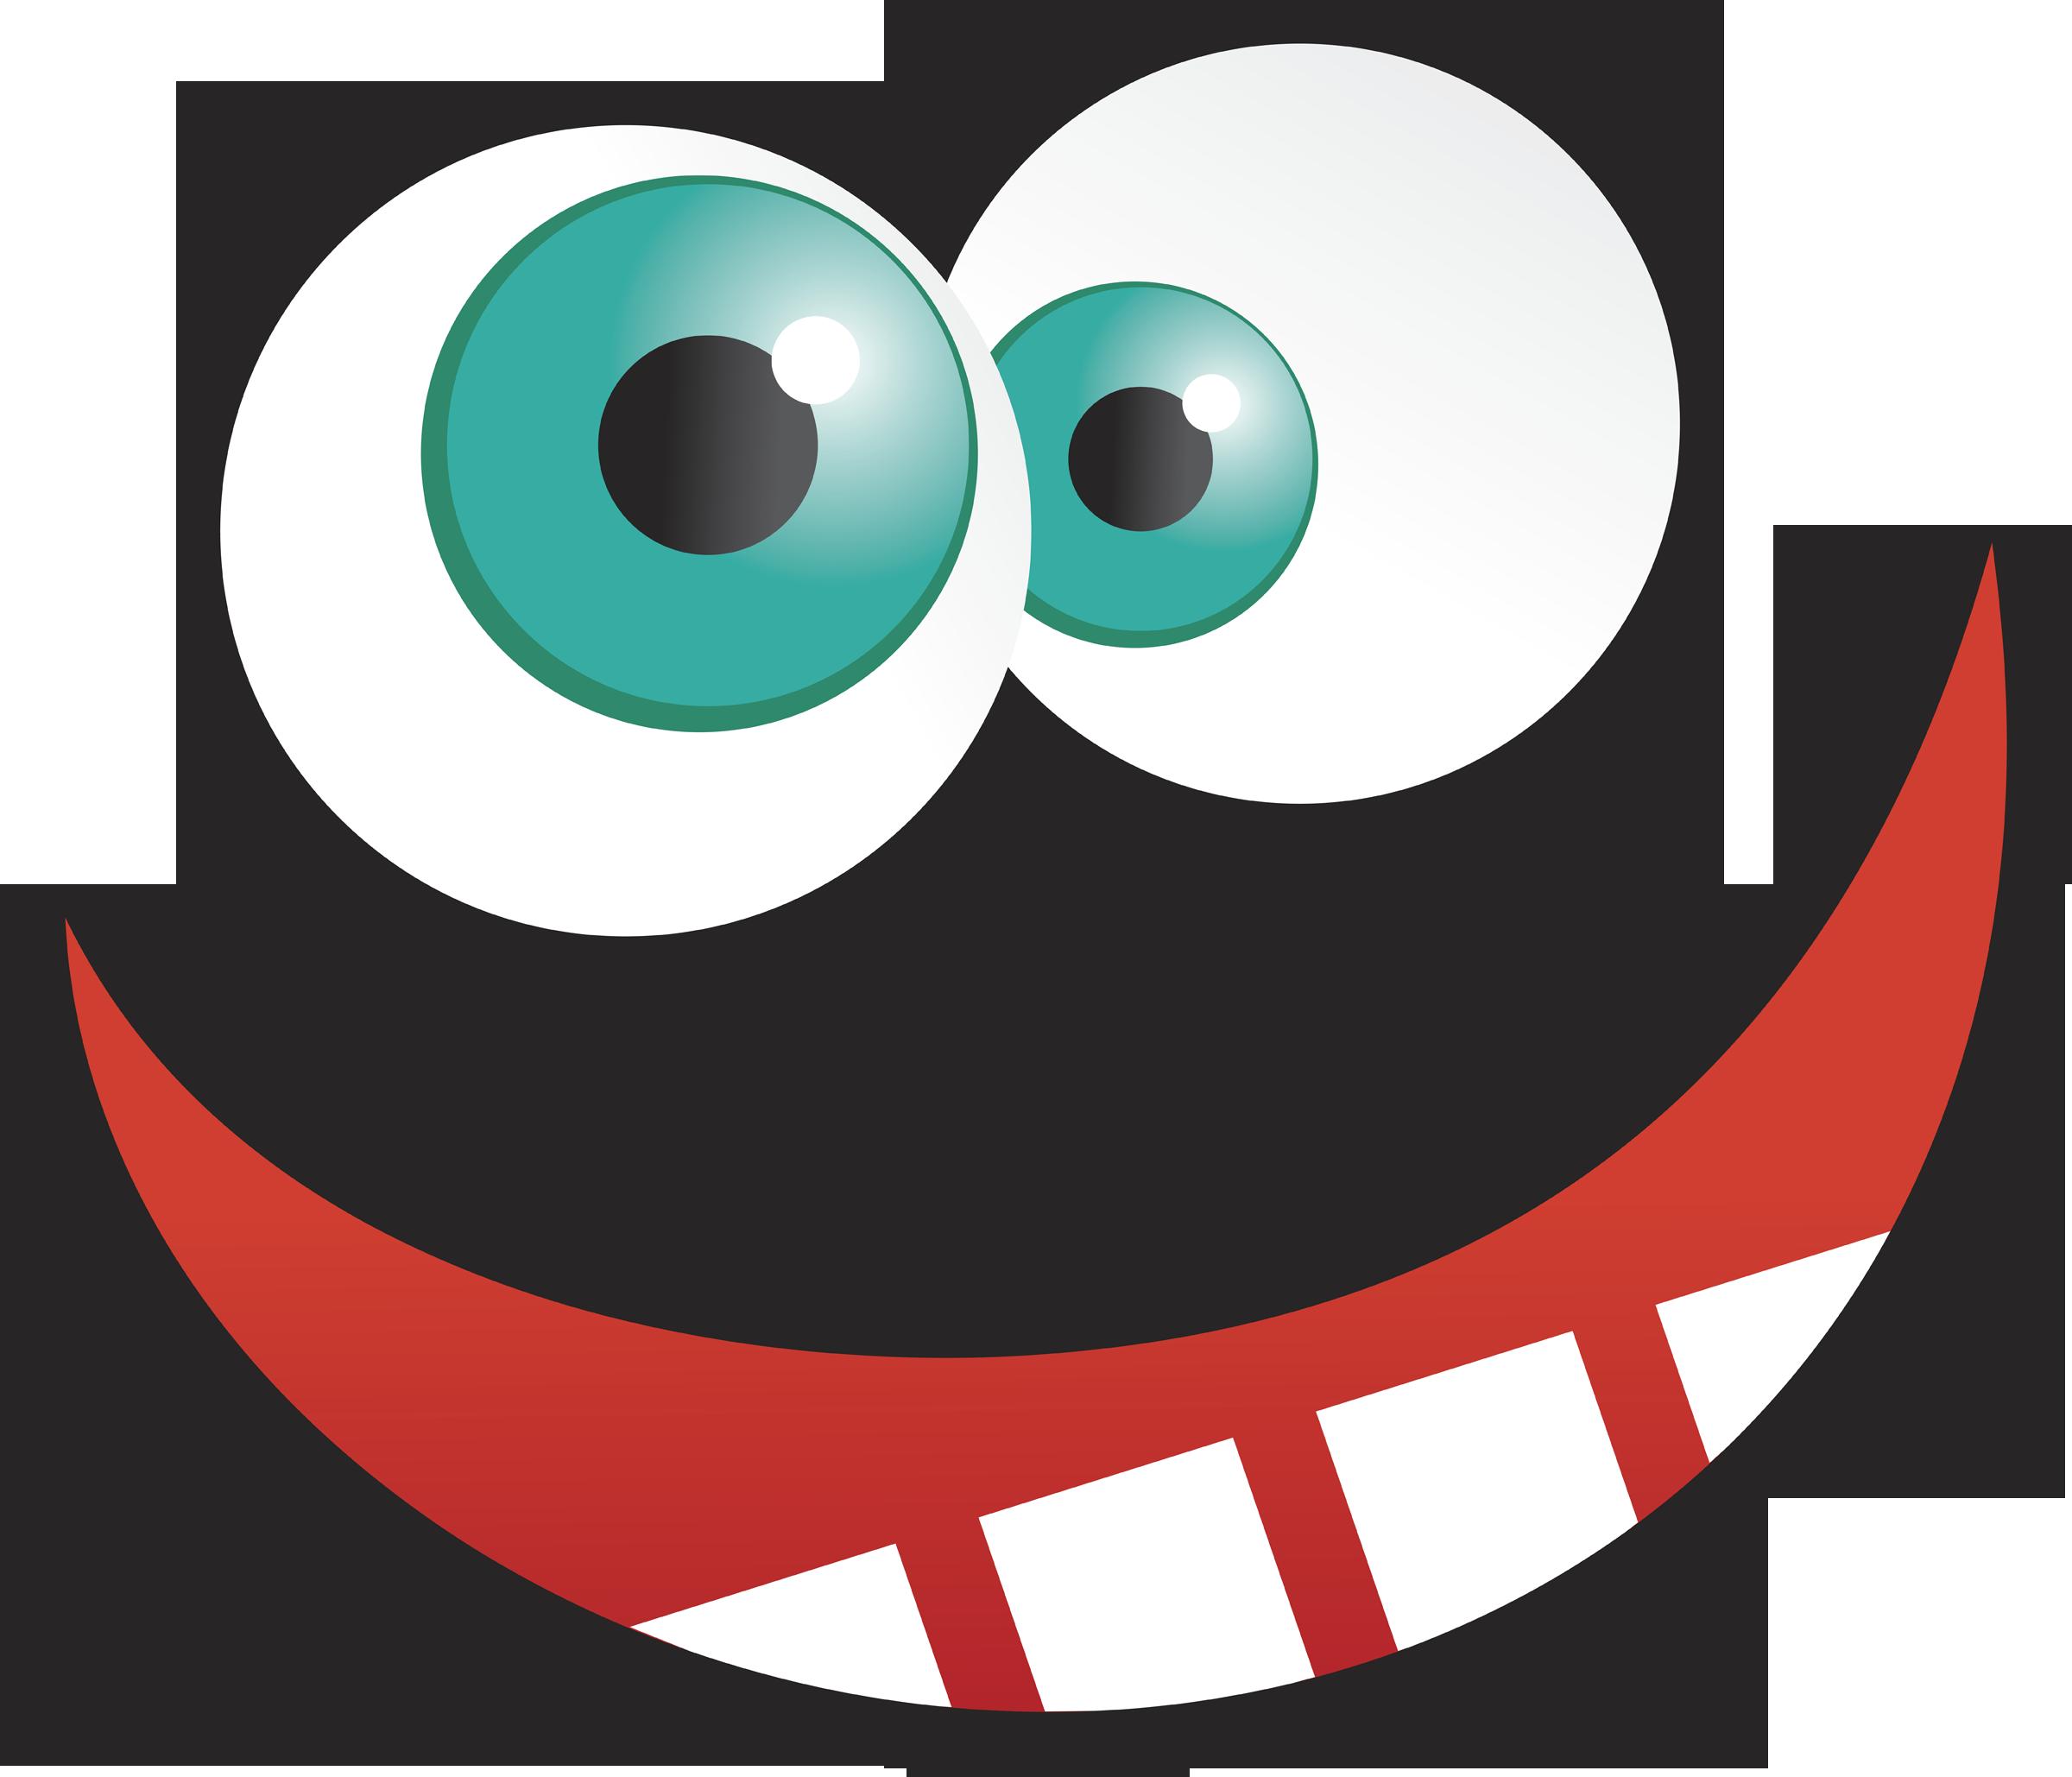 Weird eyes clipart clipart royalty free library Crazy Clipart | Free download best Crazy Clipart on ... clipart royalty free library